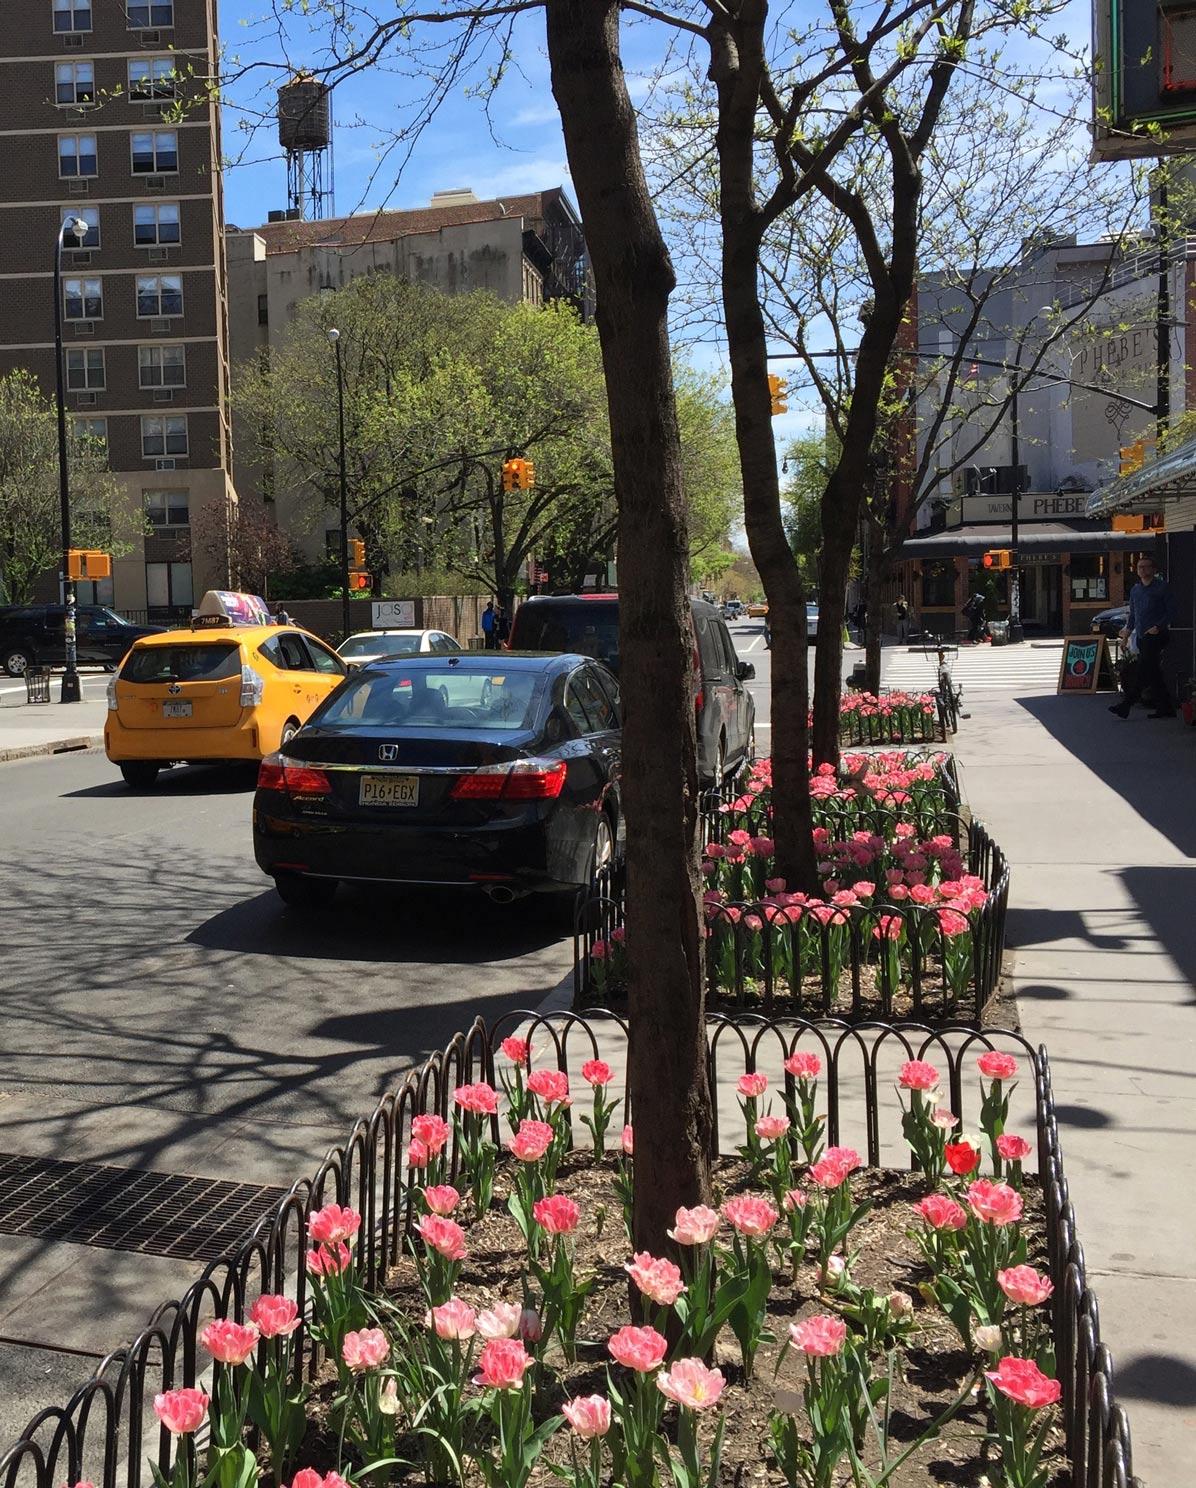 Tulips-New-York-City-Bowery-Street.jpg